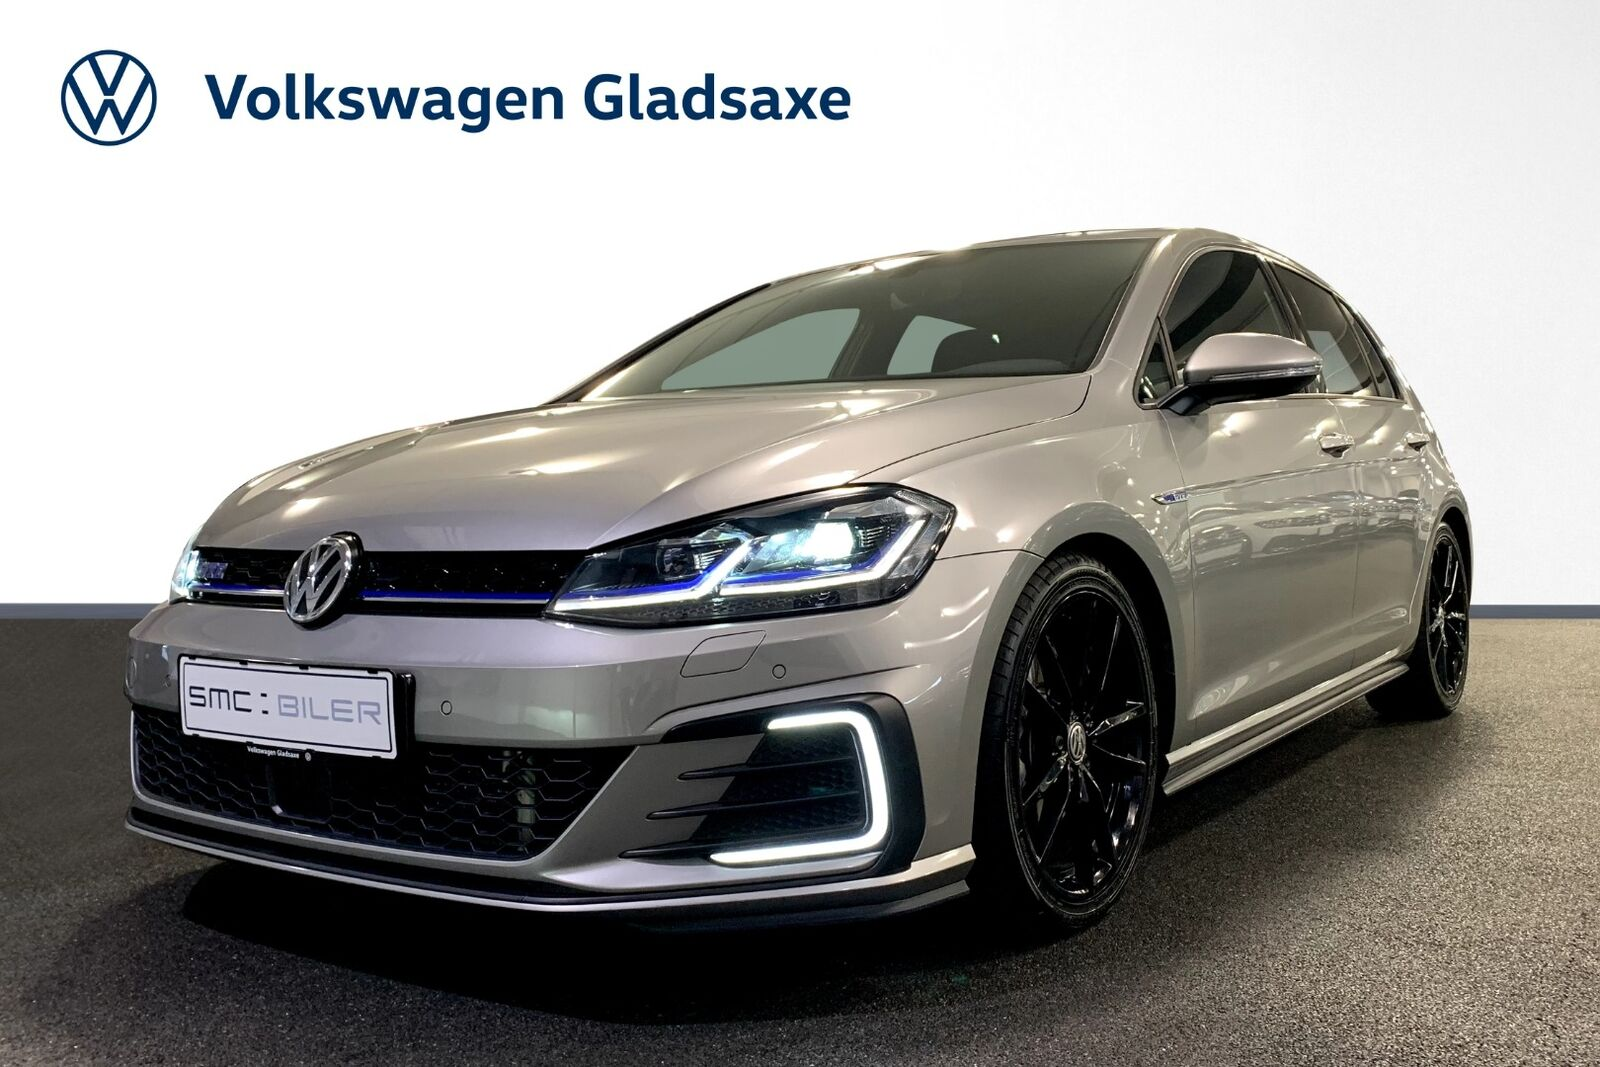 VW Golf VII 1,4 GTE DSG 5d - 349.900 kr.